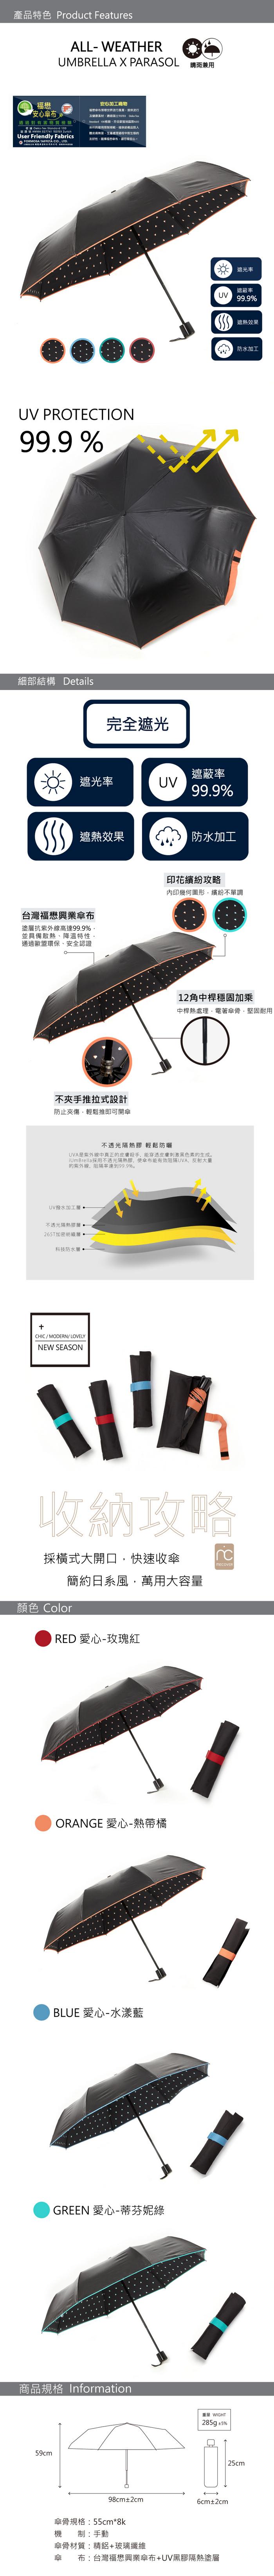 MECOVER【完美防曬】零透光黑膠加大手開傘-愛心熱帶橙